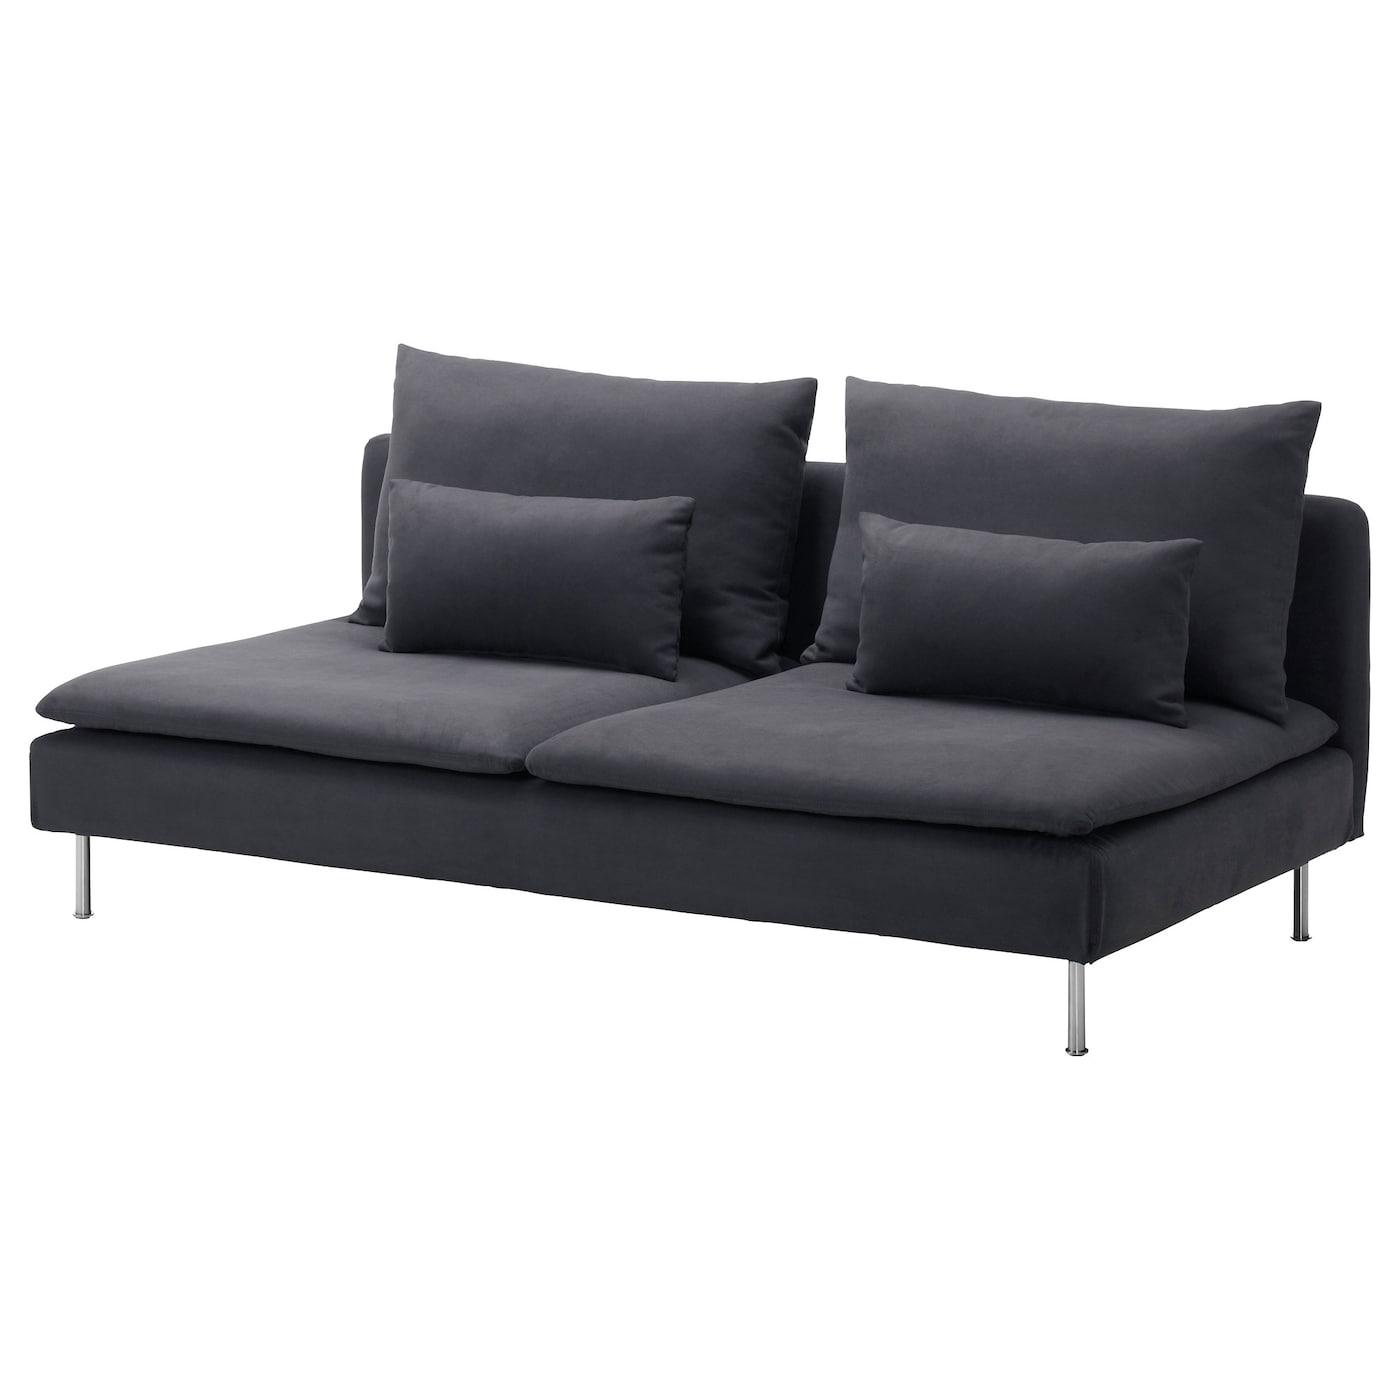 sofas de ikea rp loveseat nordvalla dark gray ikea thesofa. Black Bedroom Furniture Sets. Home Design Ideas